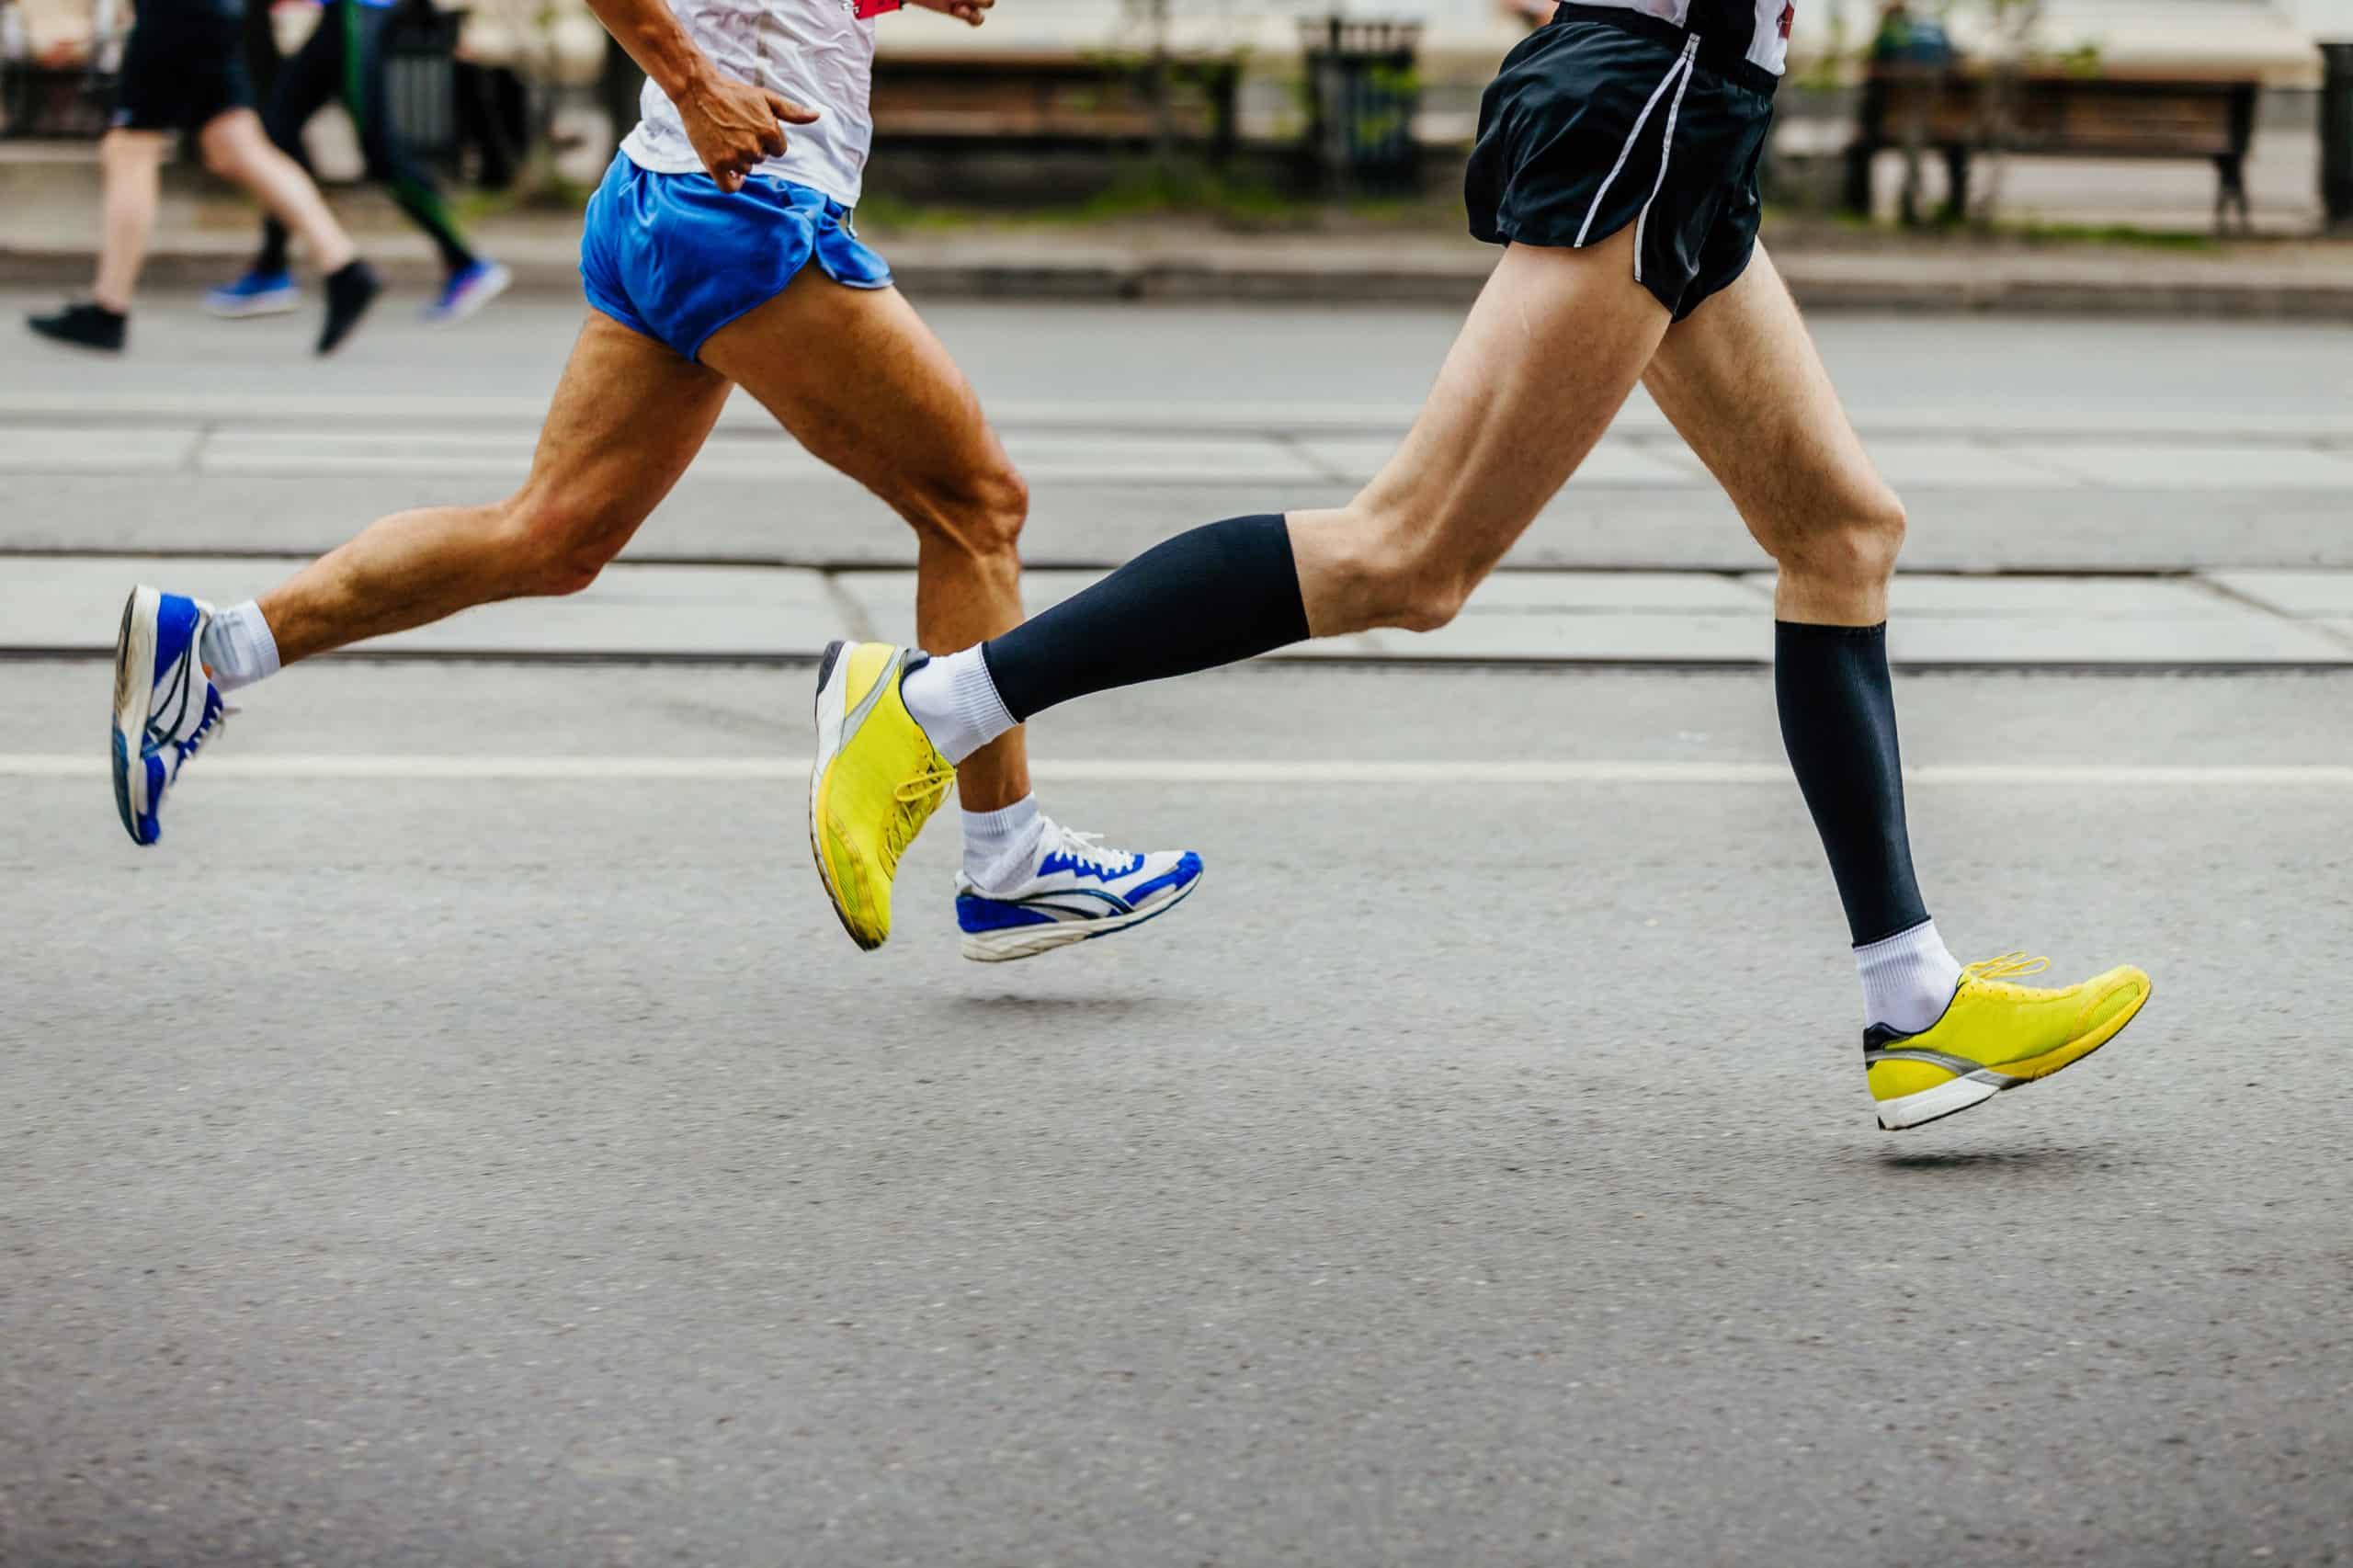 legs of two men runners